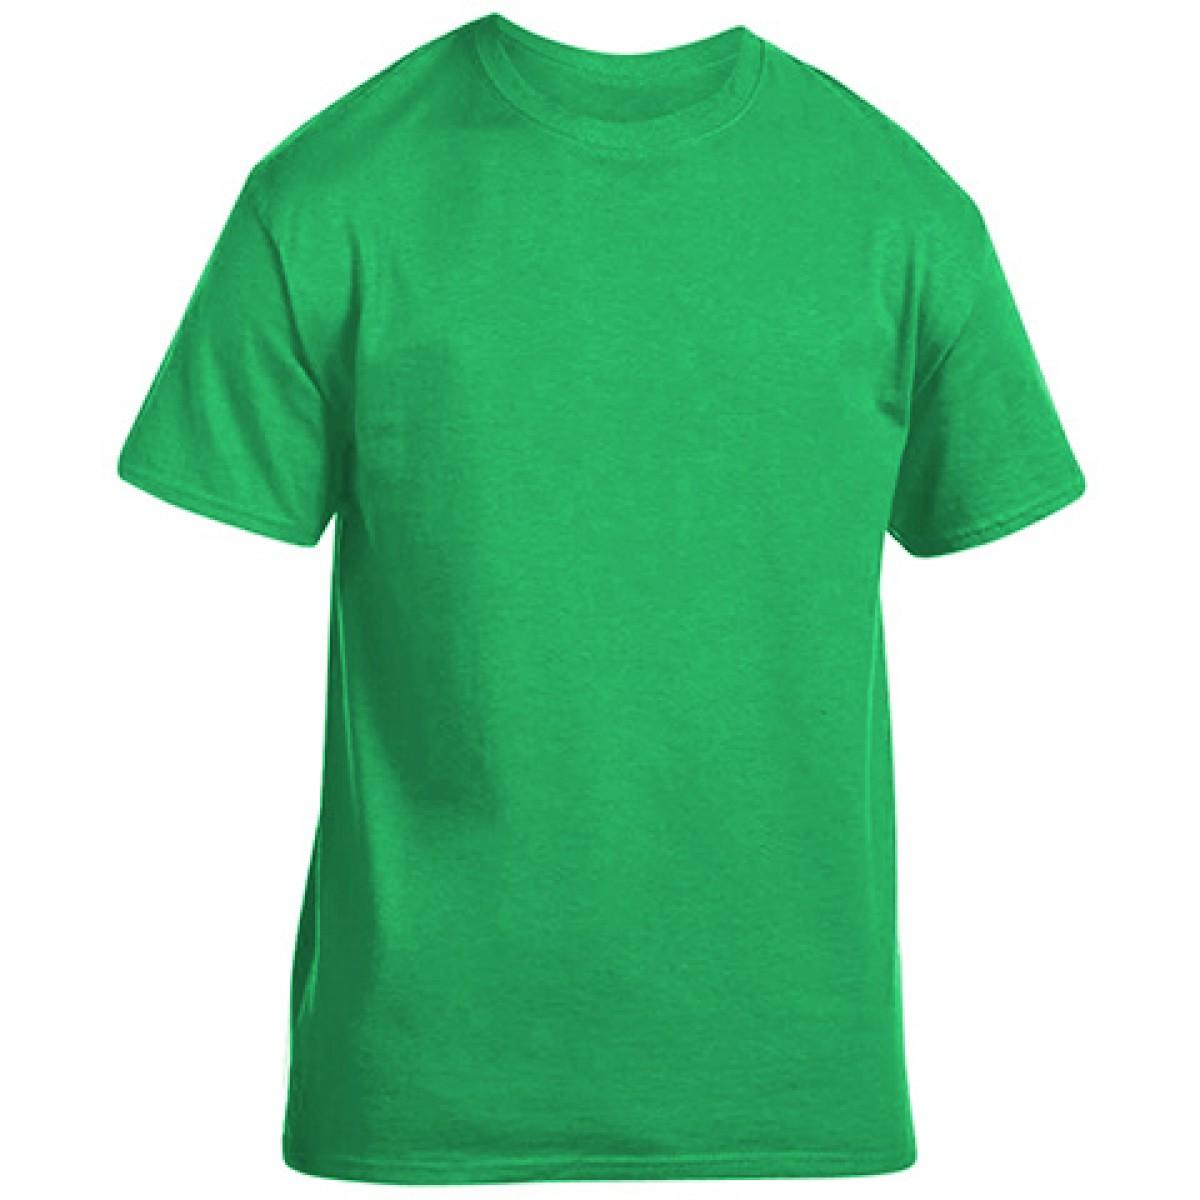 Soft 100% Cotton T-Shirt-Electric Green -3XL